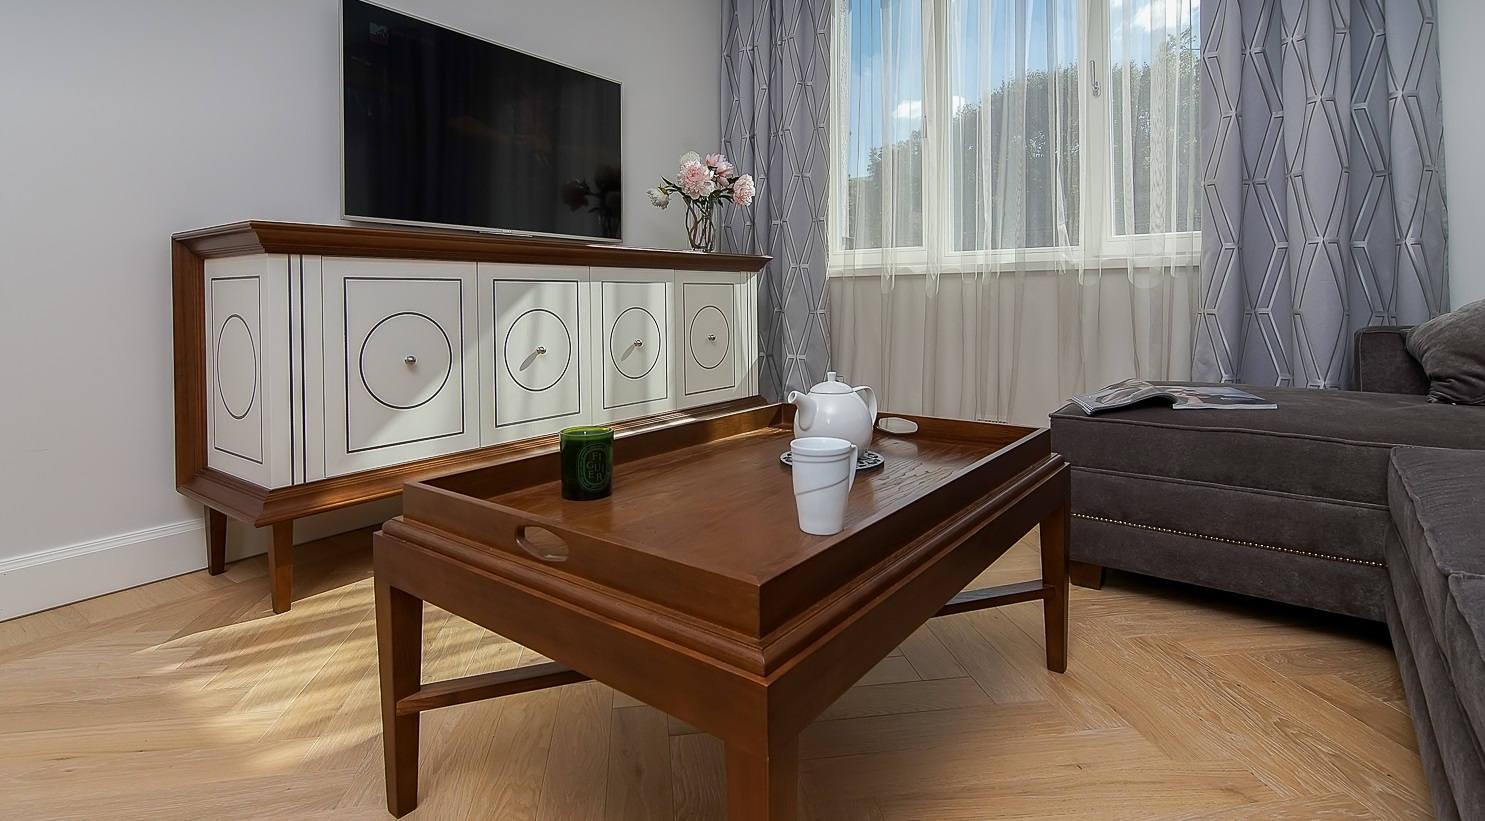 Massivholzmöbel, auch nach Maß, klassische Naturholz Möbel ...